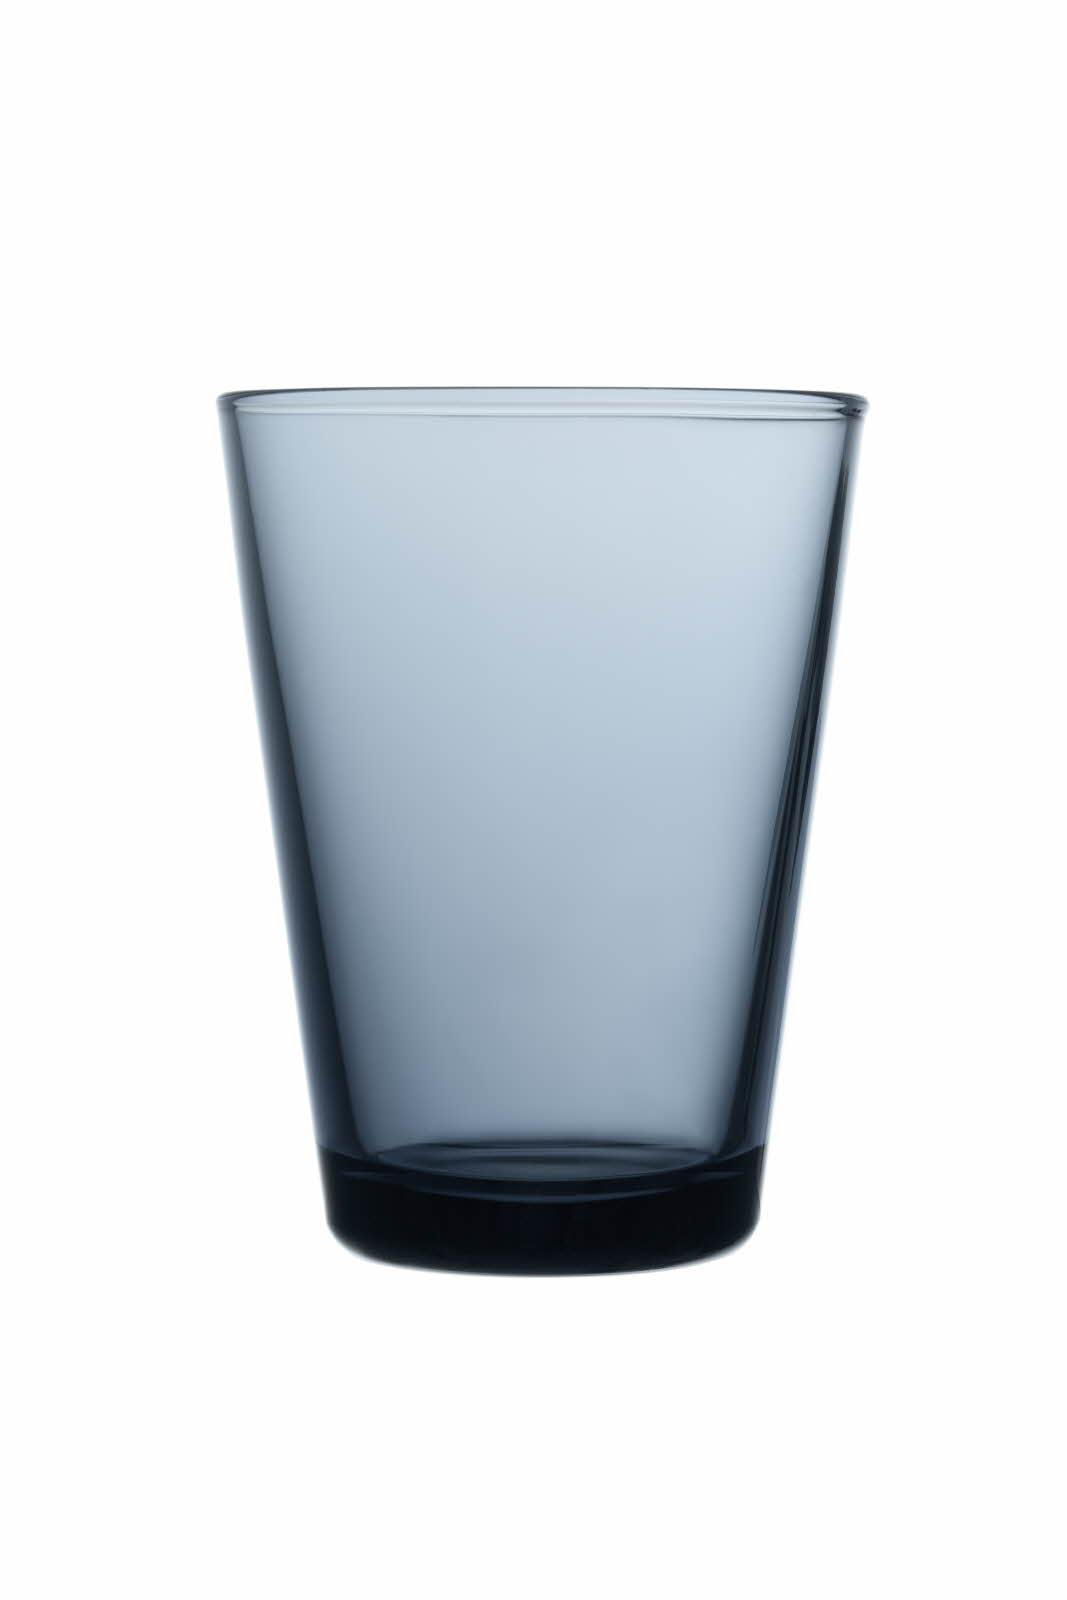 Iittala Kartio Glass Rain 2stk 40 cl